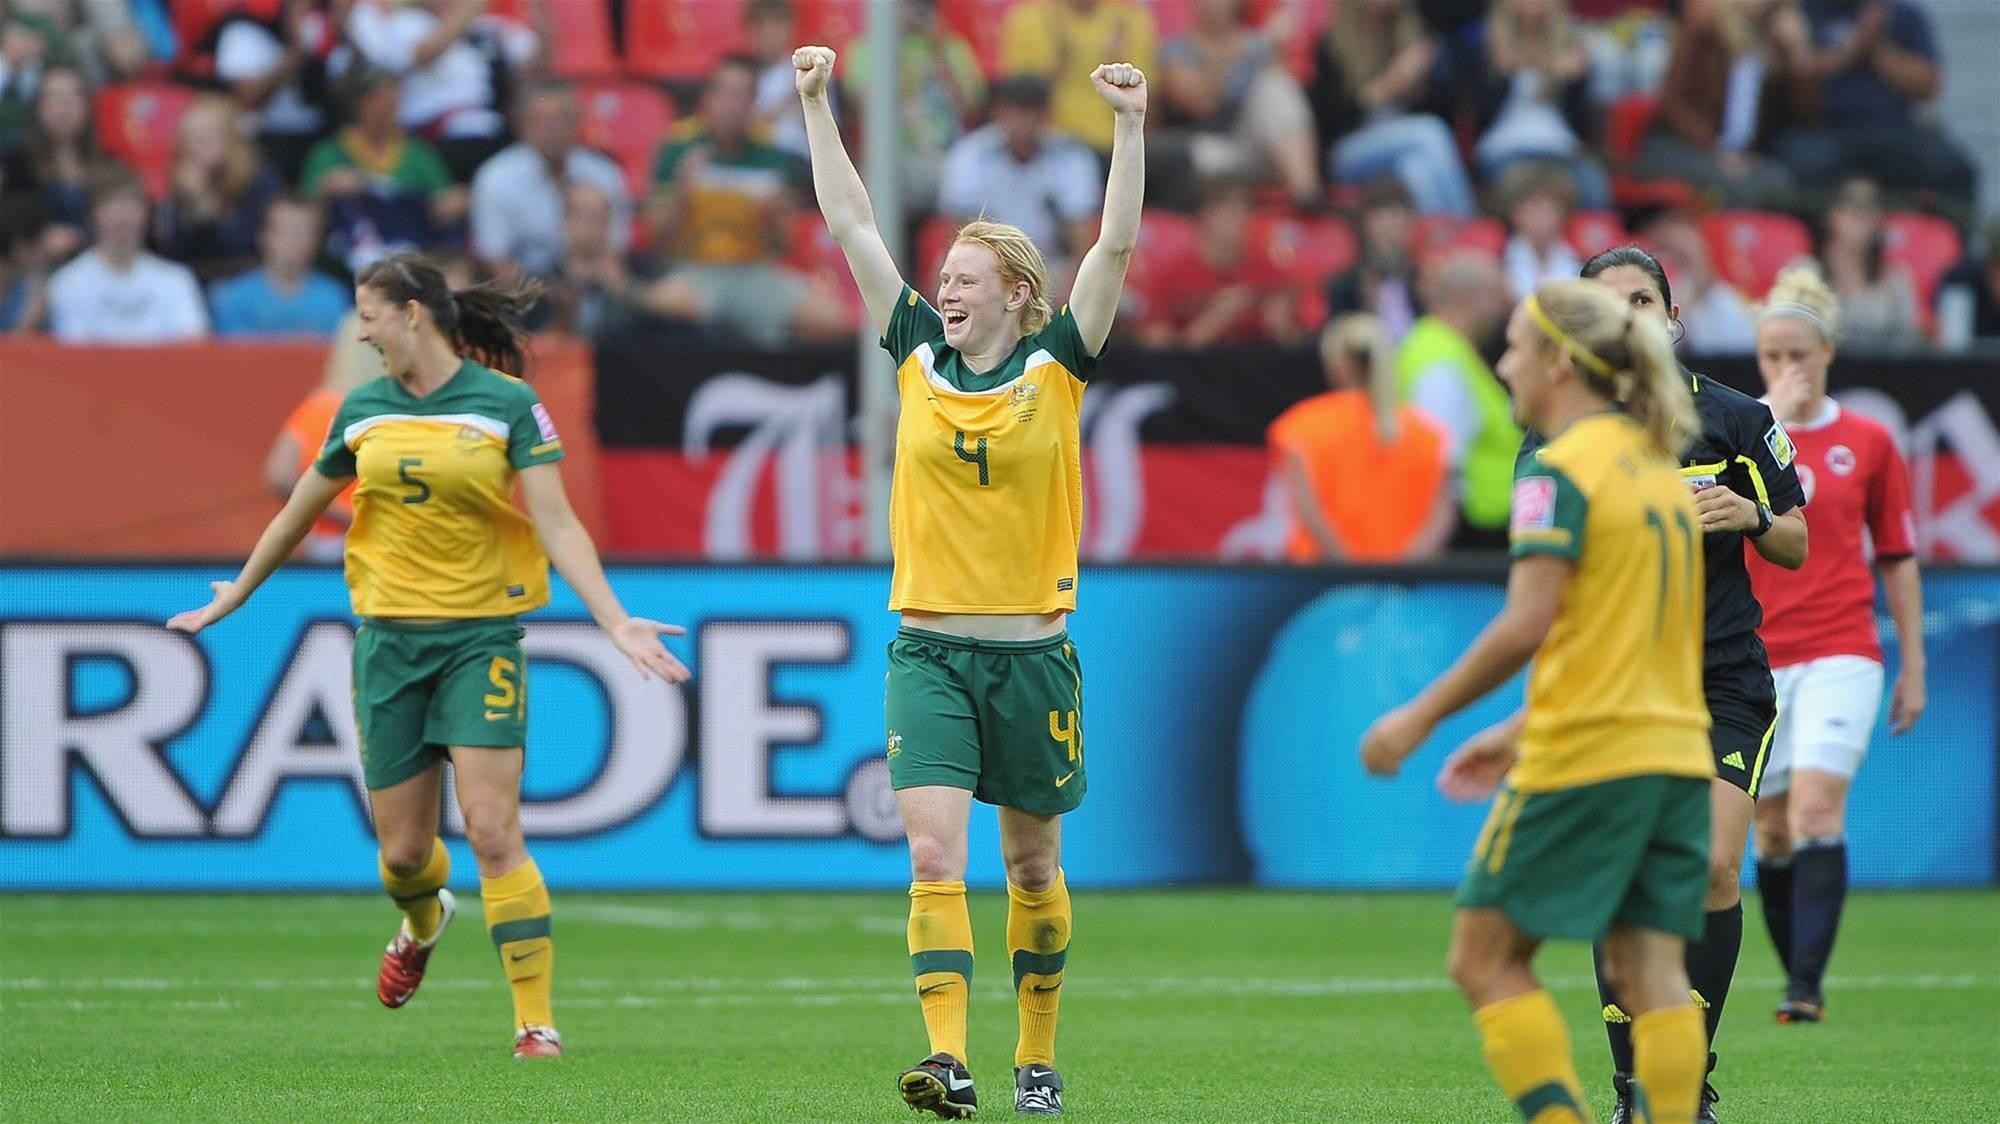 Celebrating Polkinghorne's 100th Matildas game